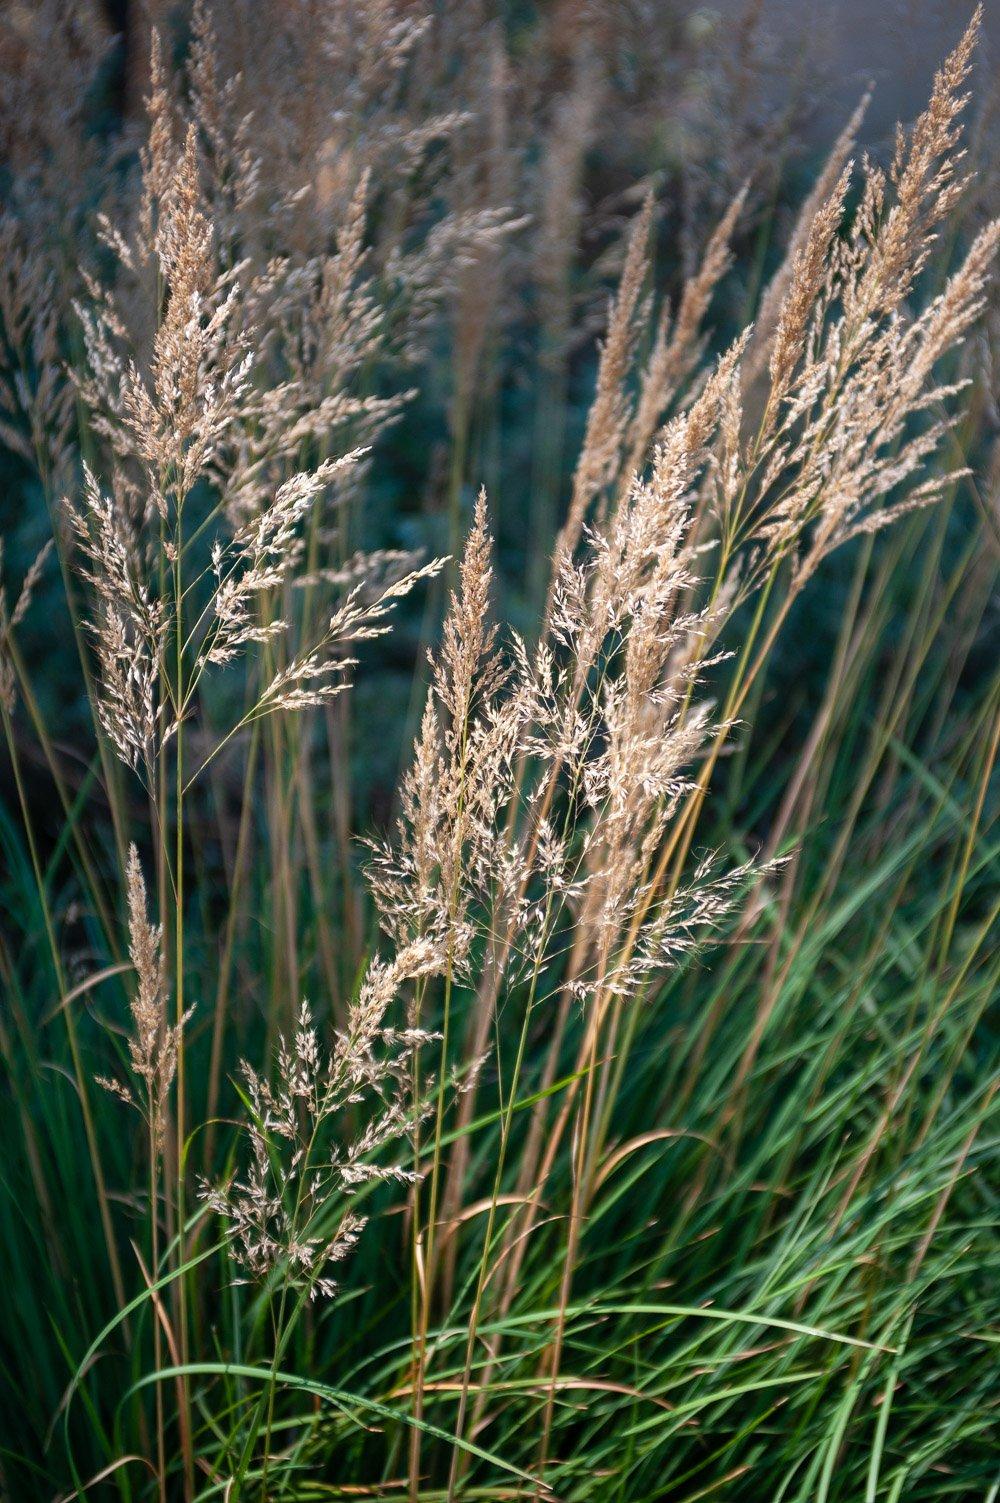 Beauty of ornamental grass